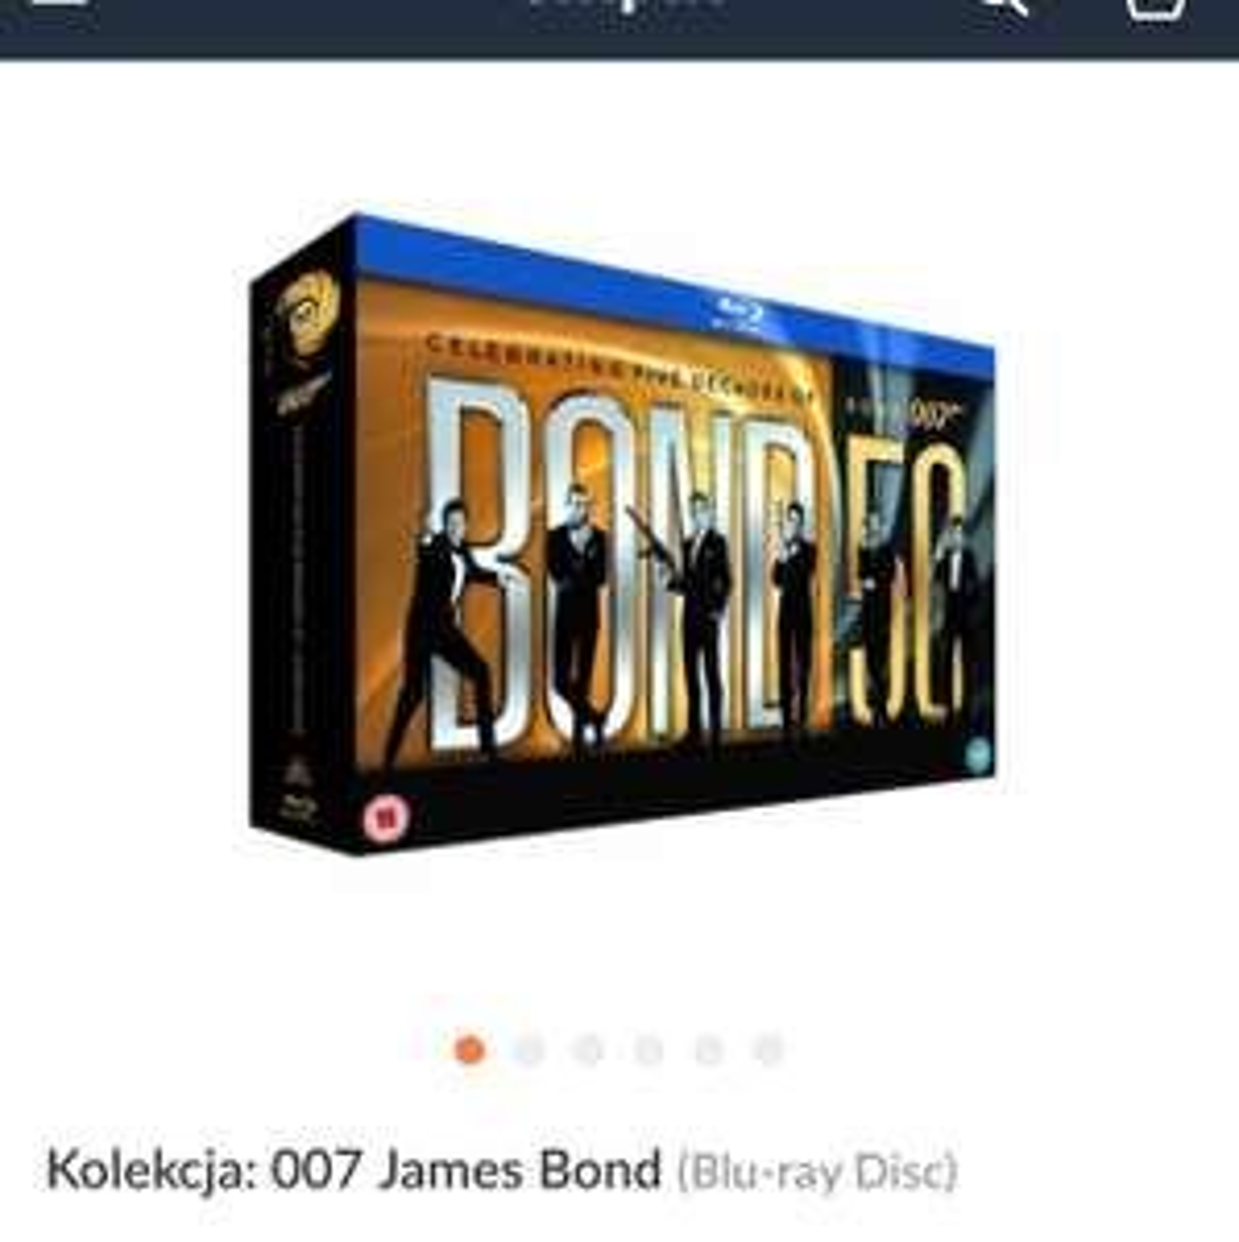 Kolekcja na 50 lecia Bonda na blu-ray